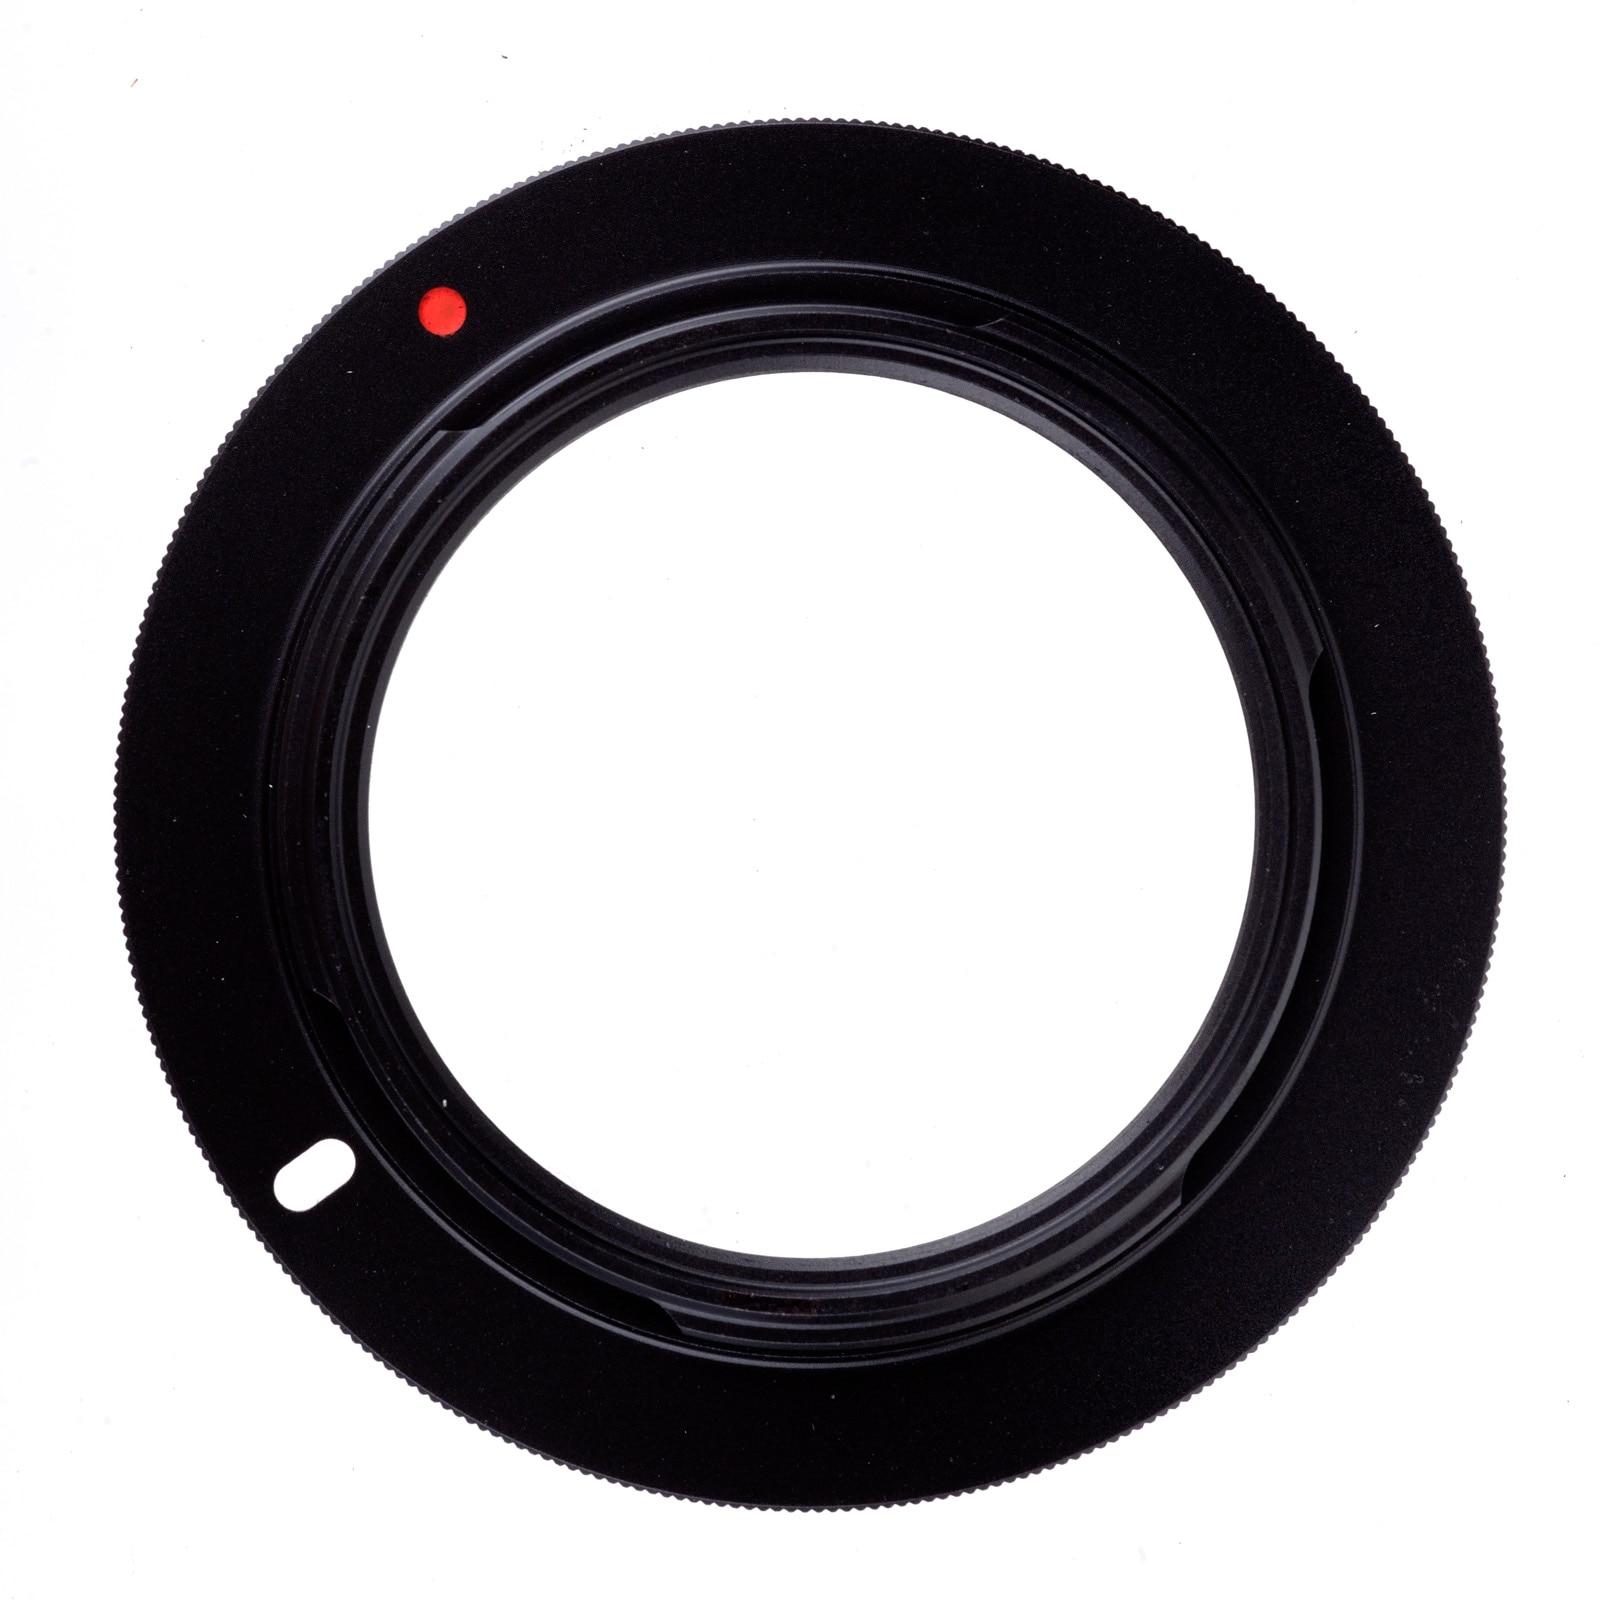 M39-AI M39 Aluminum Alloy Mounting Lens Adapter Ring Manual Focus For Nikon AI Mount DSLR Cameras Lens Adapter